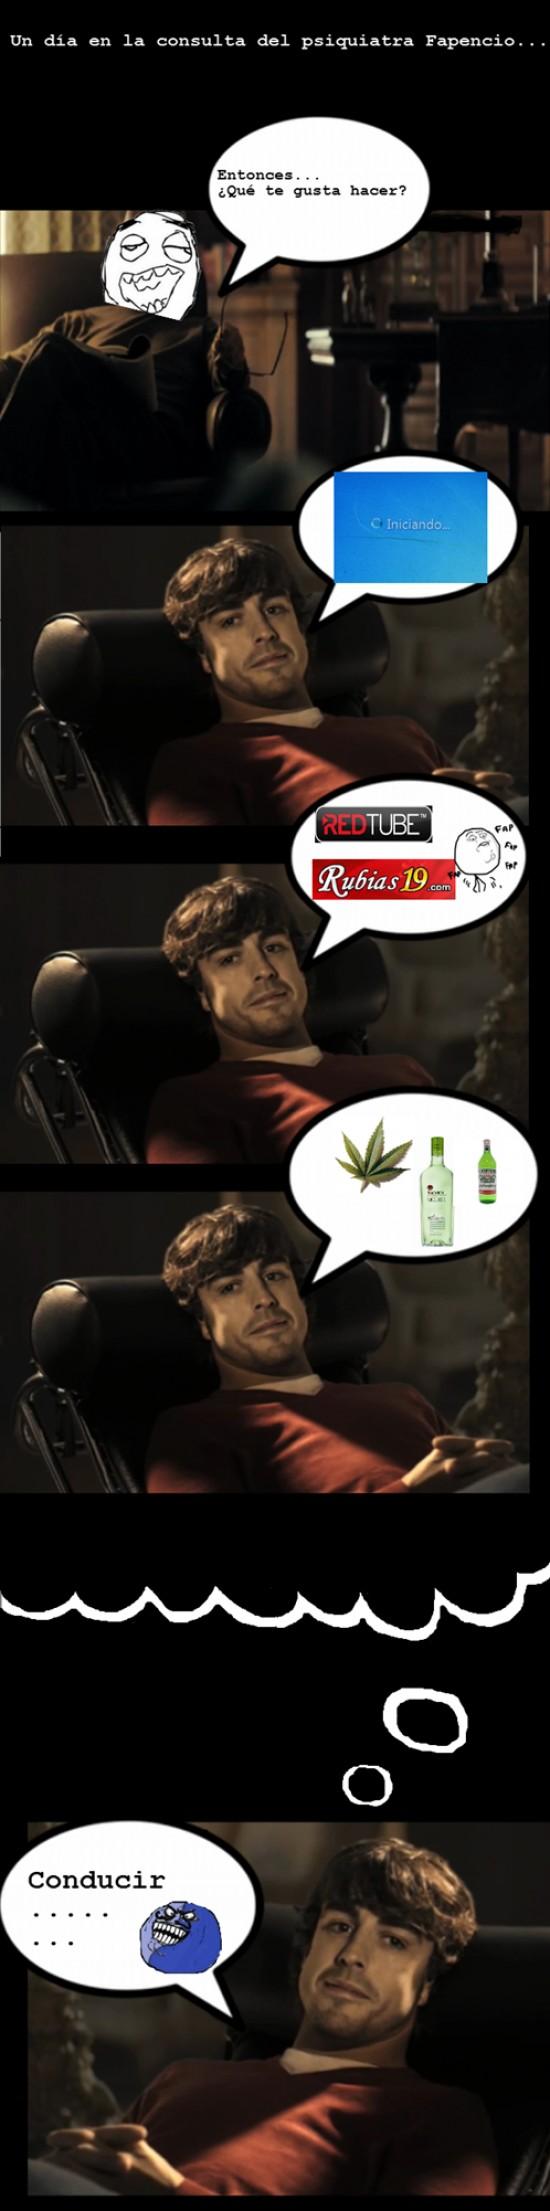 alcohol,Alonso,conducir,drogas,psiquiatra